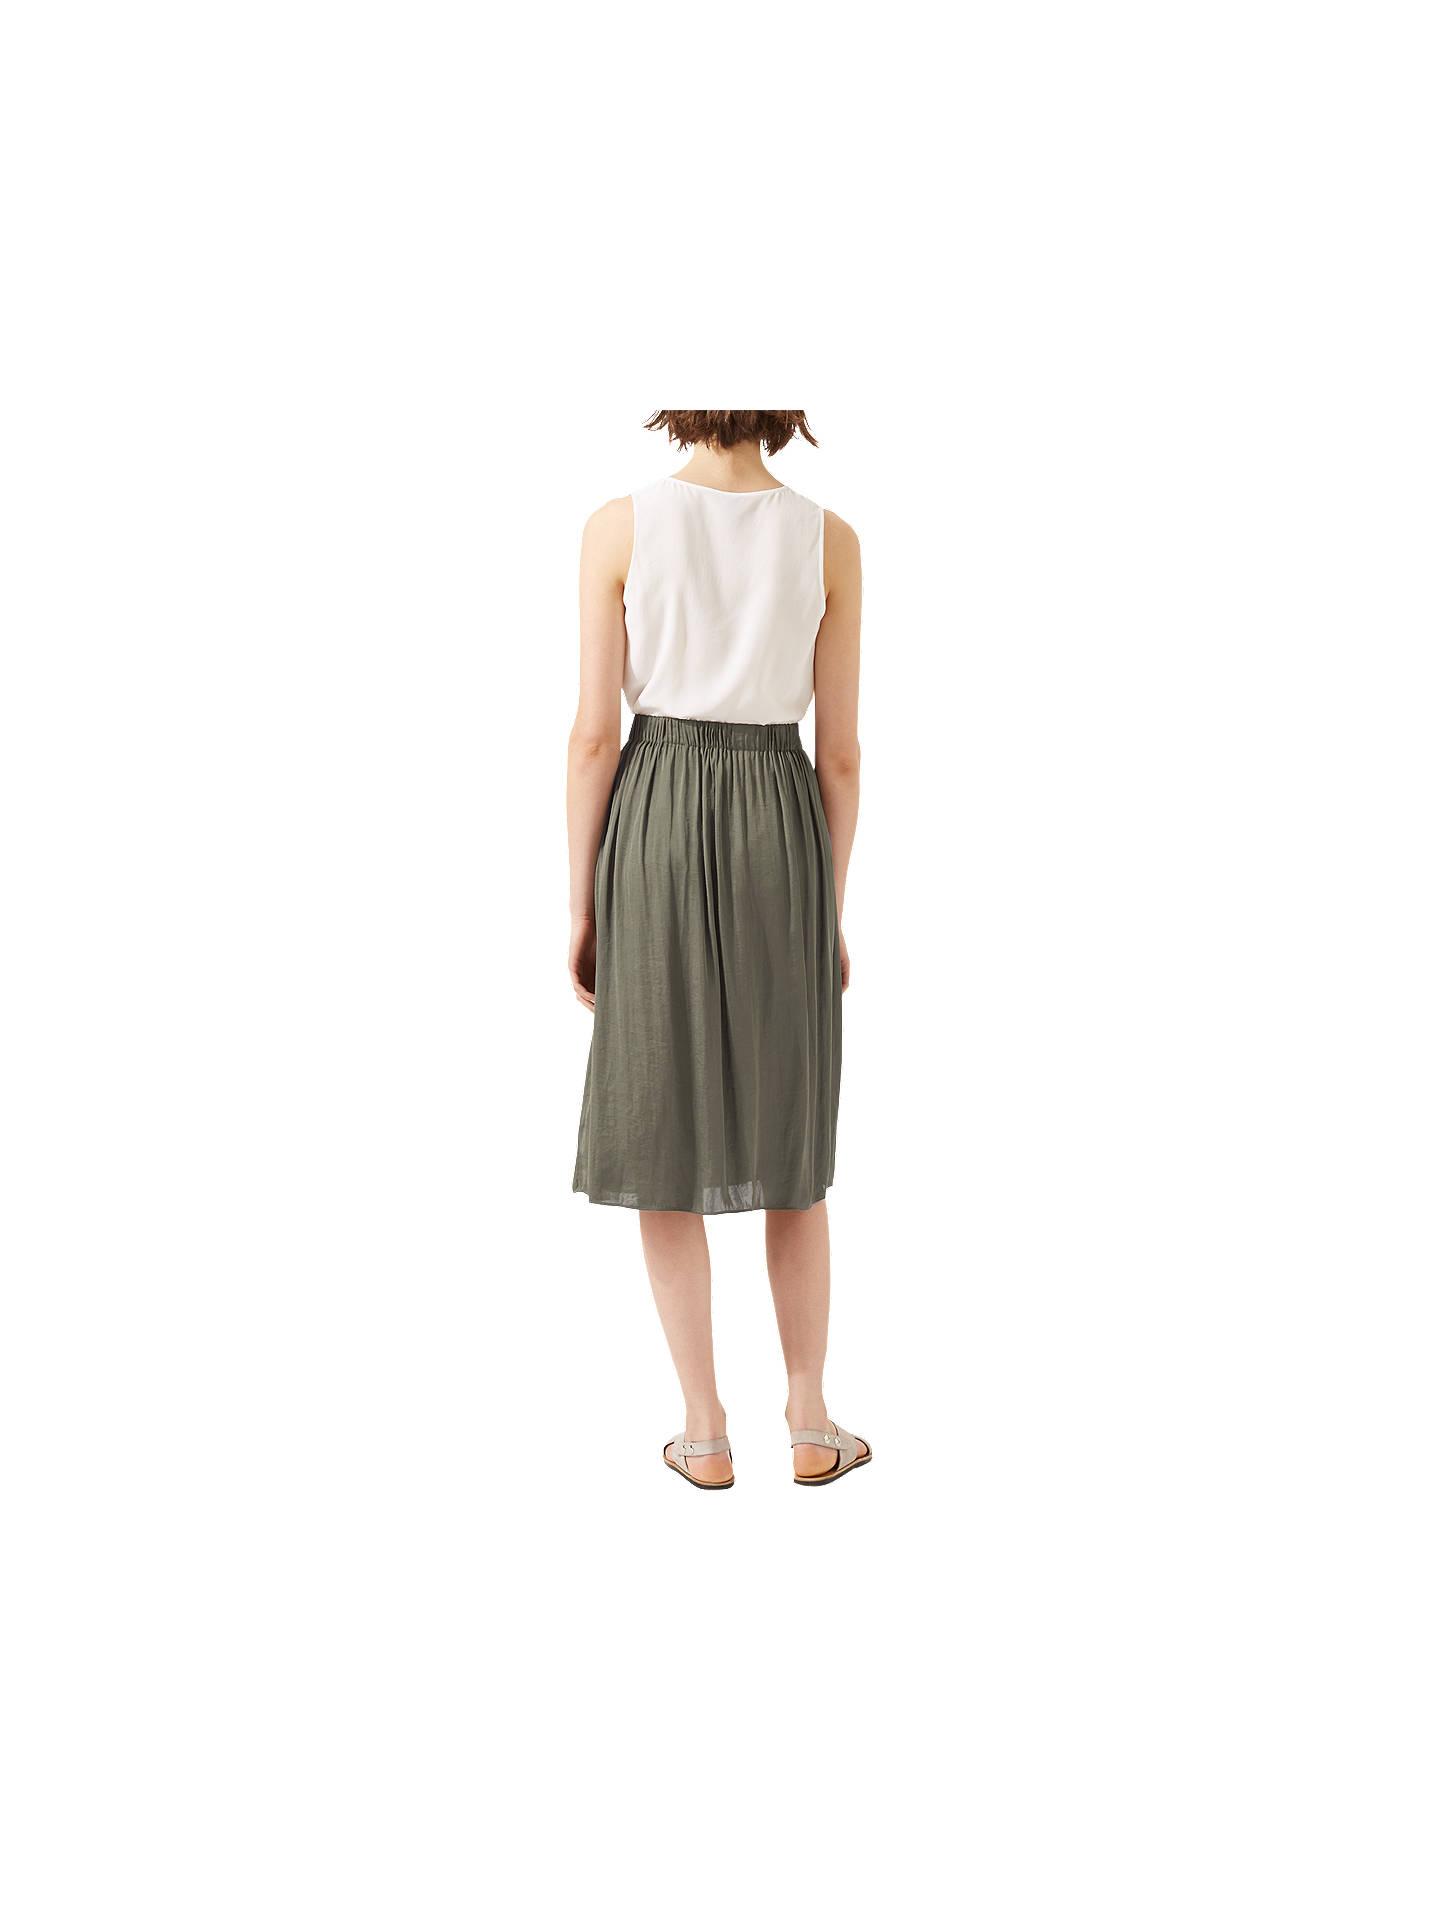 4bc7924634 ... Buy Jigsaw Crocus Drape Midi Skirt, Cactus Green, 6 Online at  johnlewis.com ...